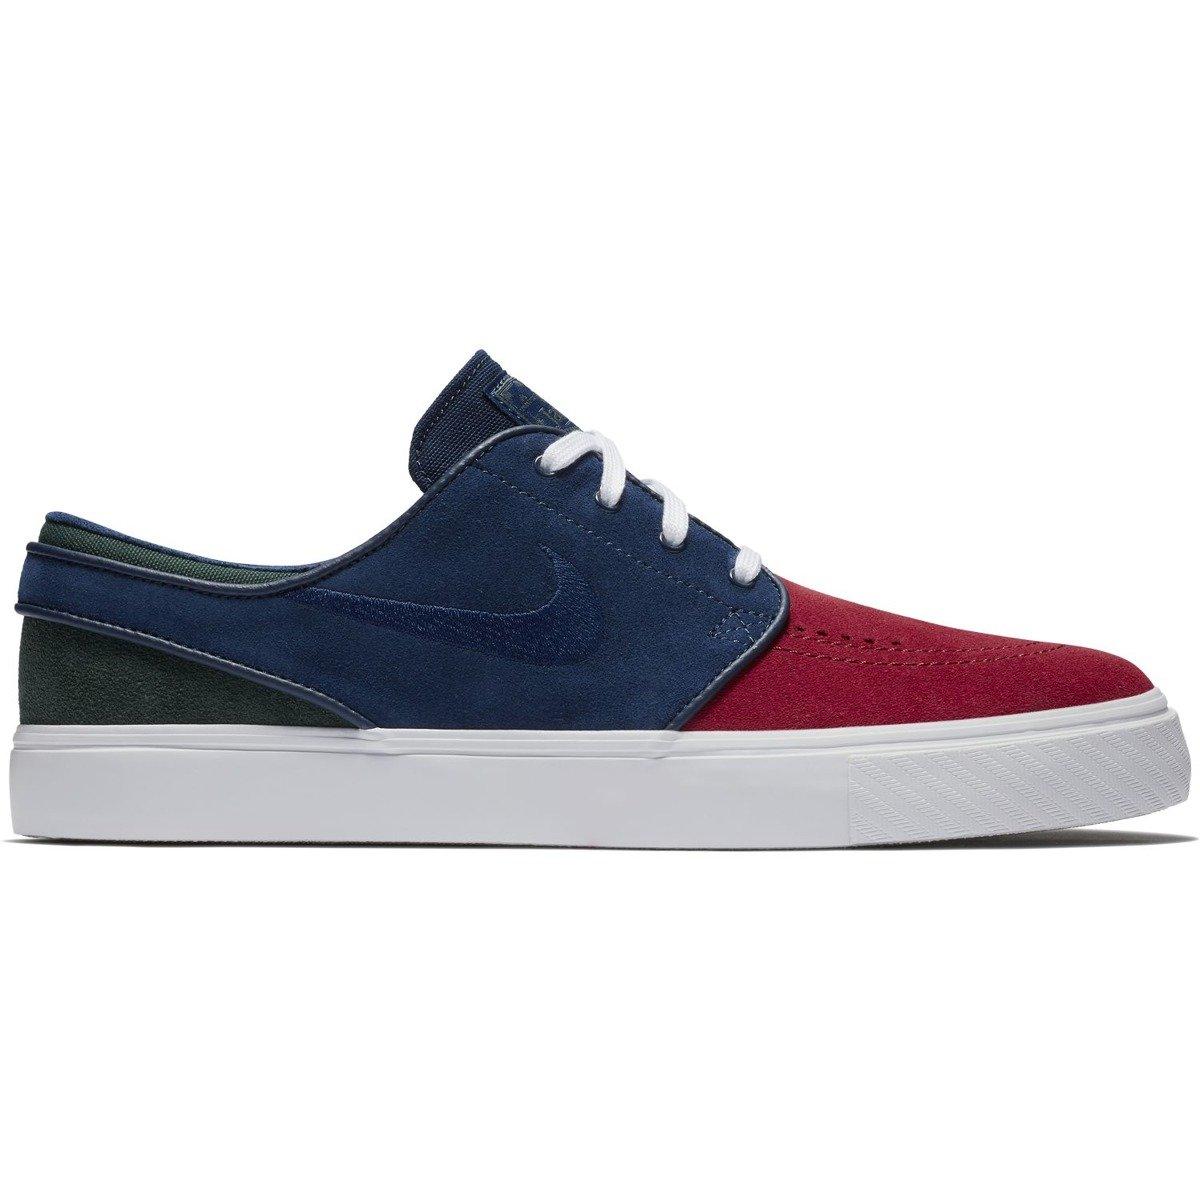 sale retailer 9453d 6605c nike sb janoski RED CRUSH BLUE VOID-WHITE-MIDNIGHT GREEN Click to zoom ...